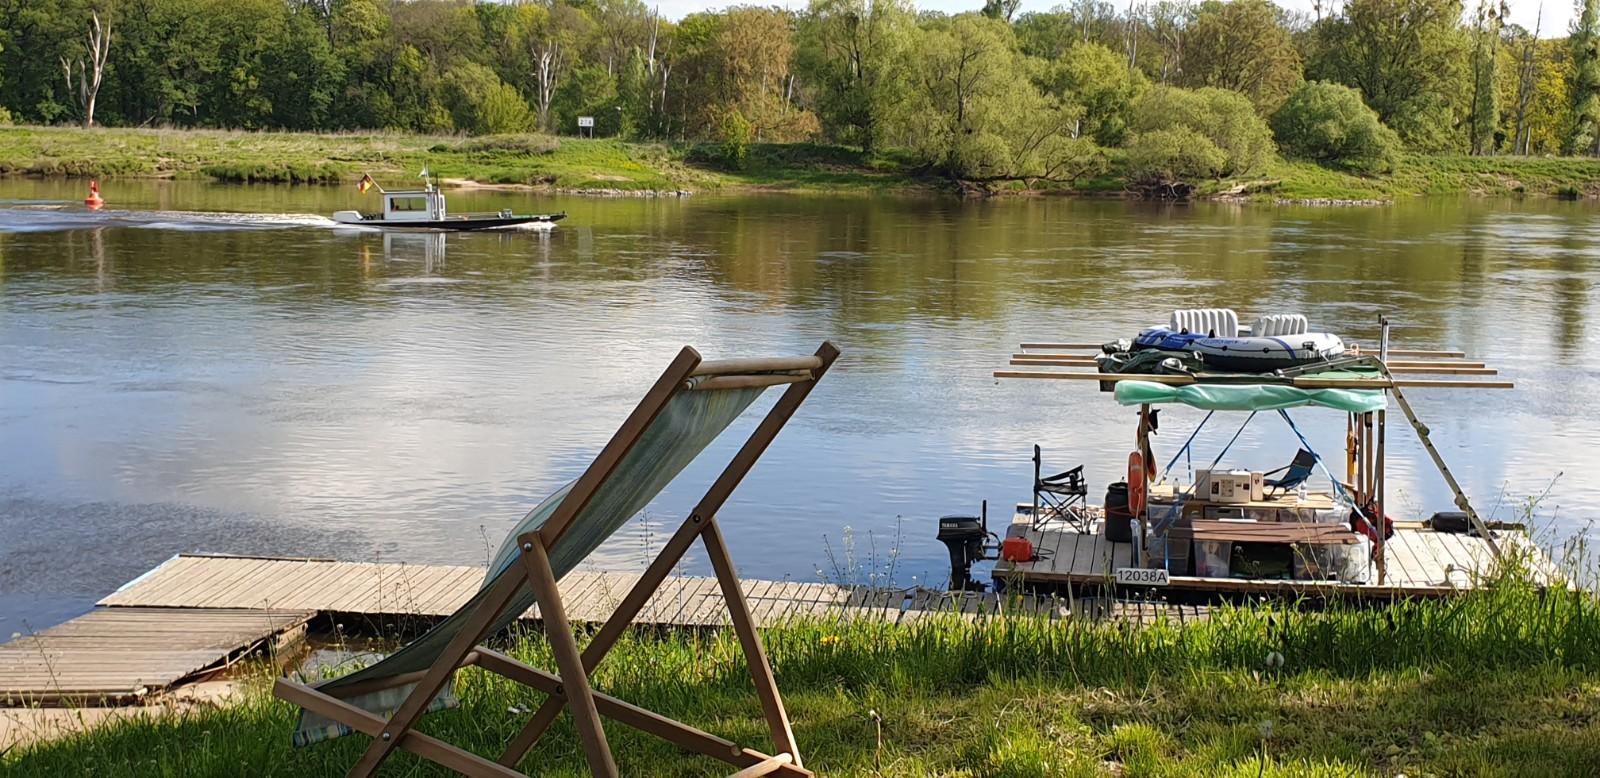 Meßboot Aken signalisiert: Fahrrinne OB - Gute Fahrt